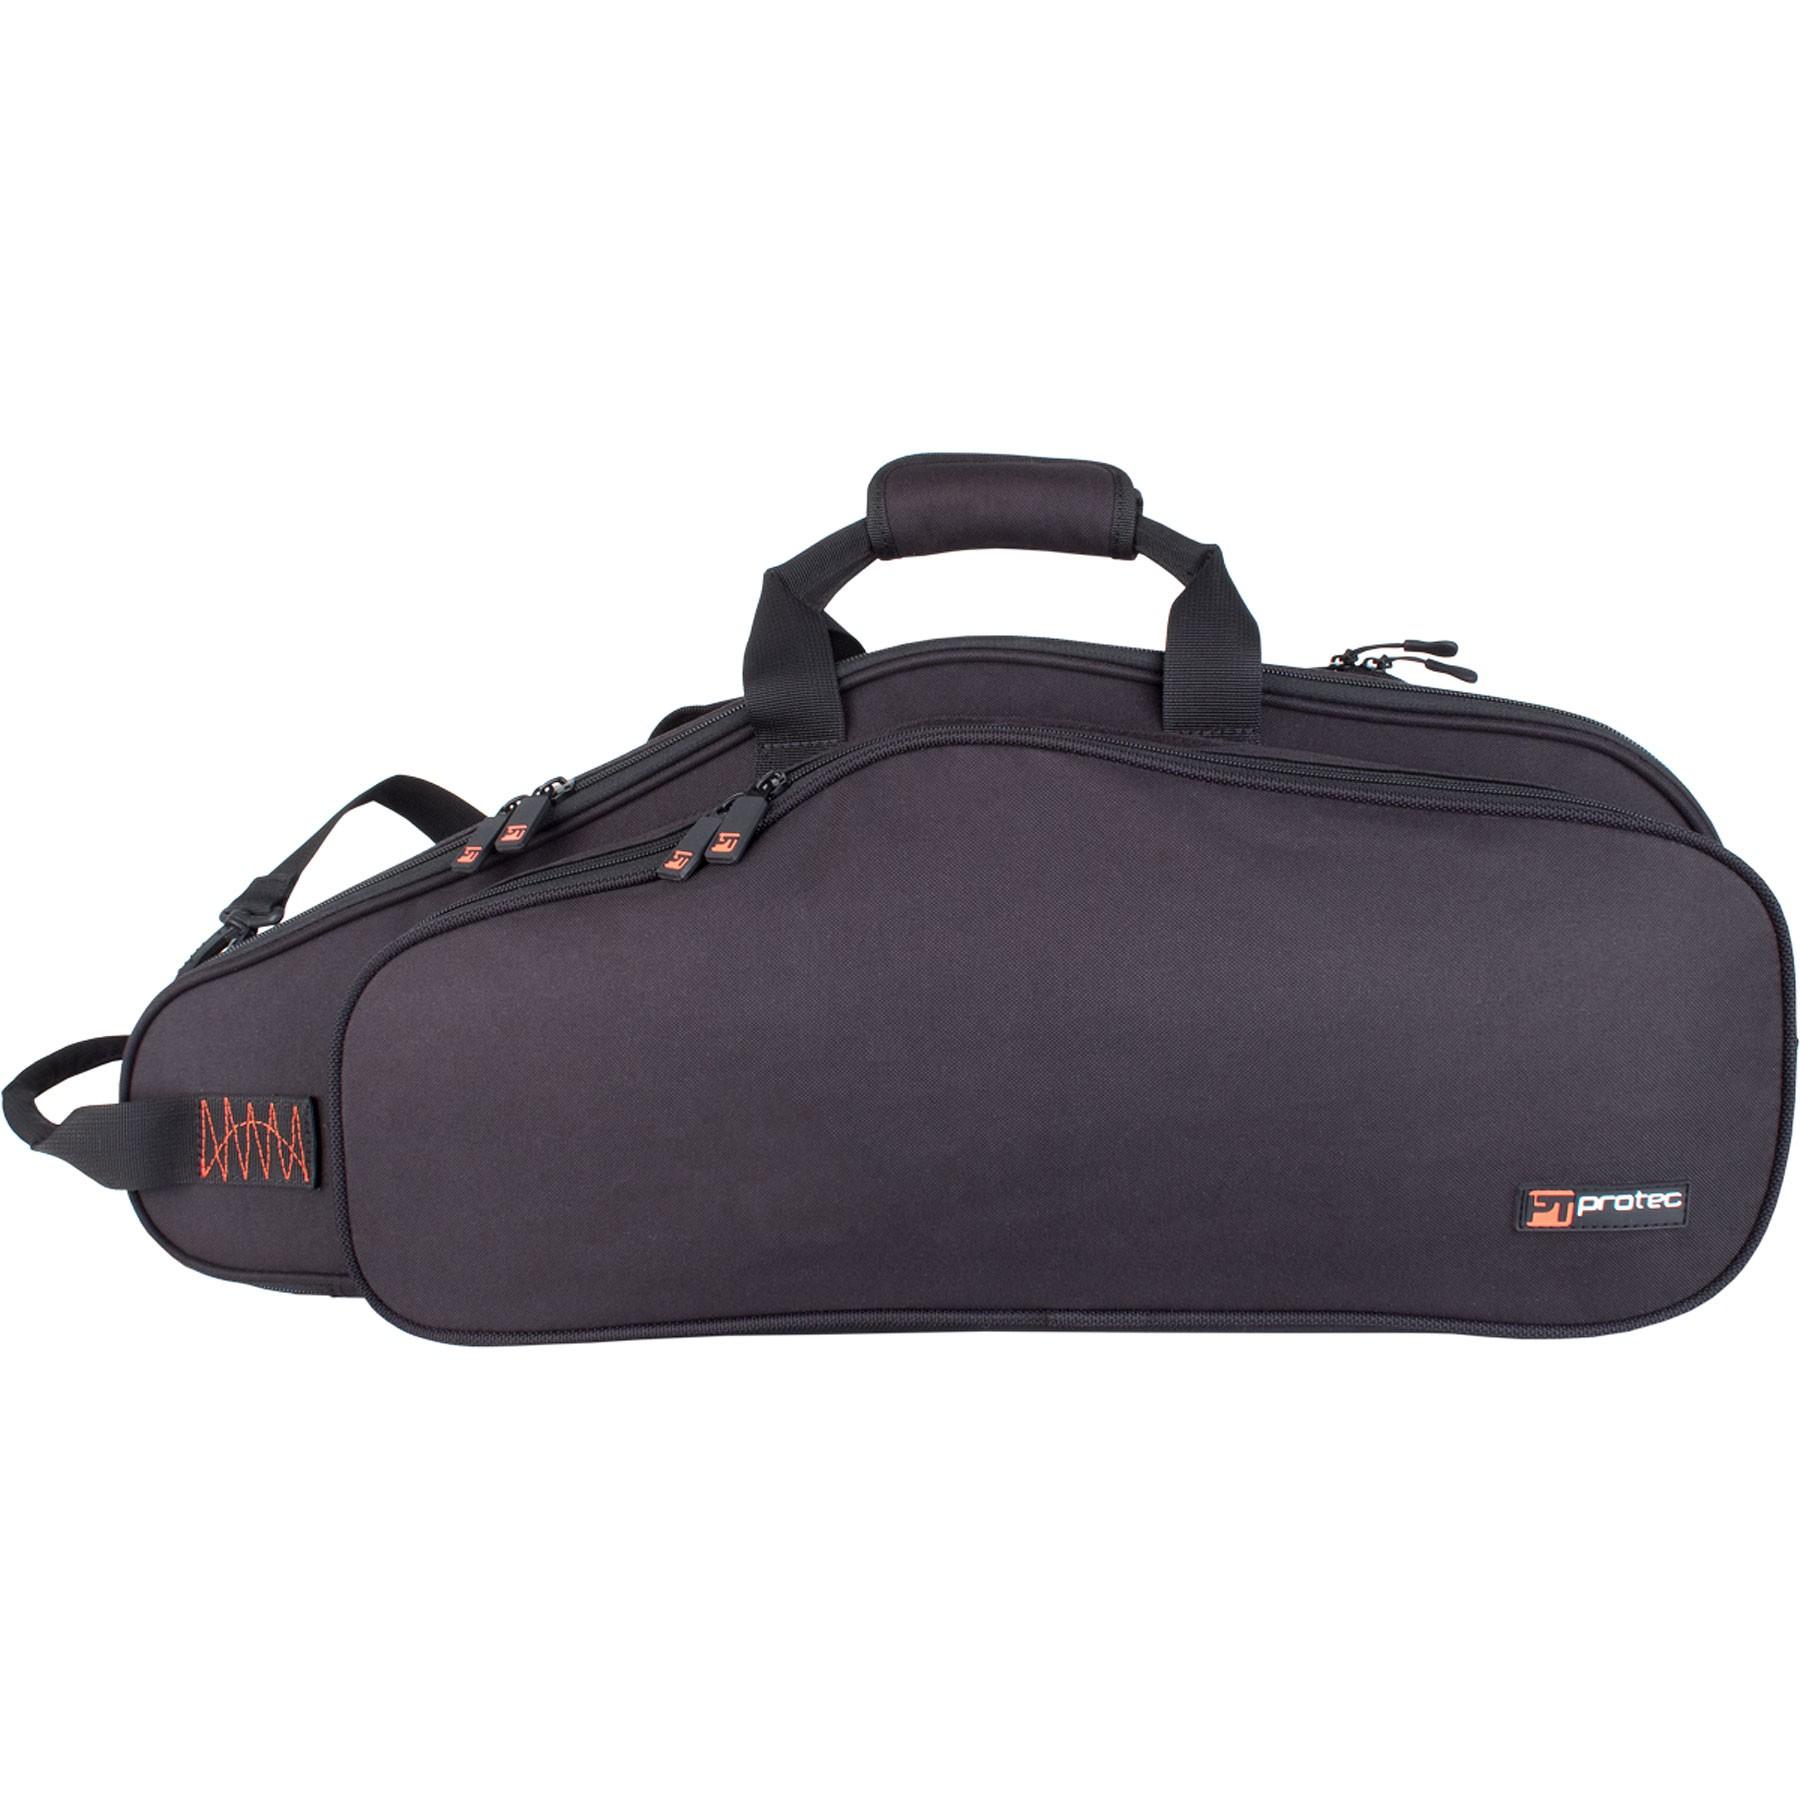 Protec Alto Saxophone Explorer Gig Bag with Sheet Music Pocket (C237X)